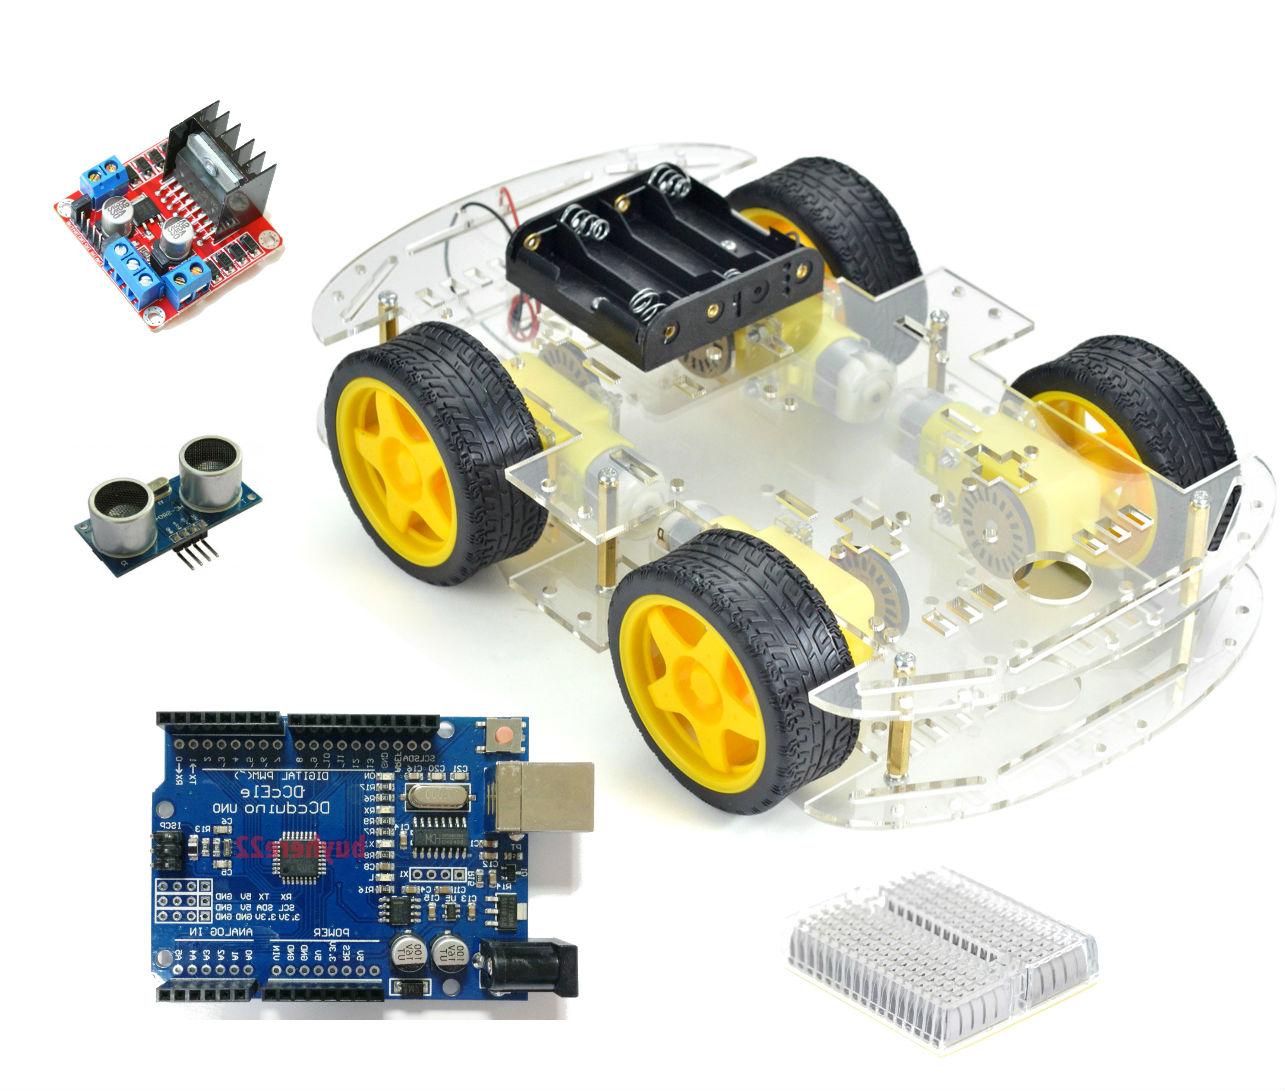 Kit engine smart robot wd car arduino hc sr driver